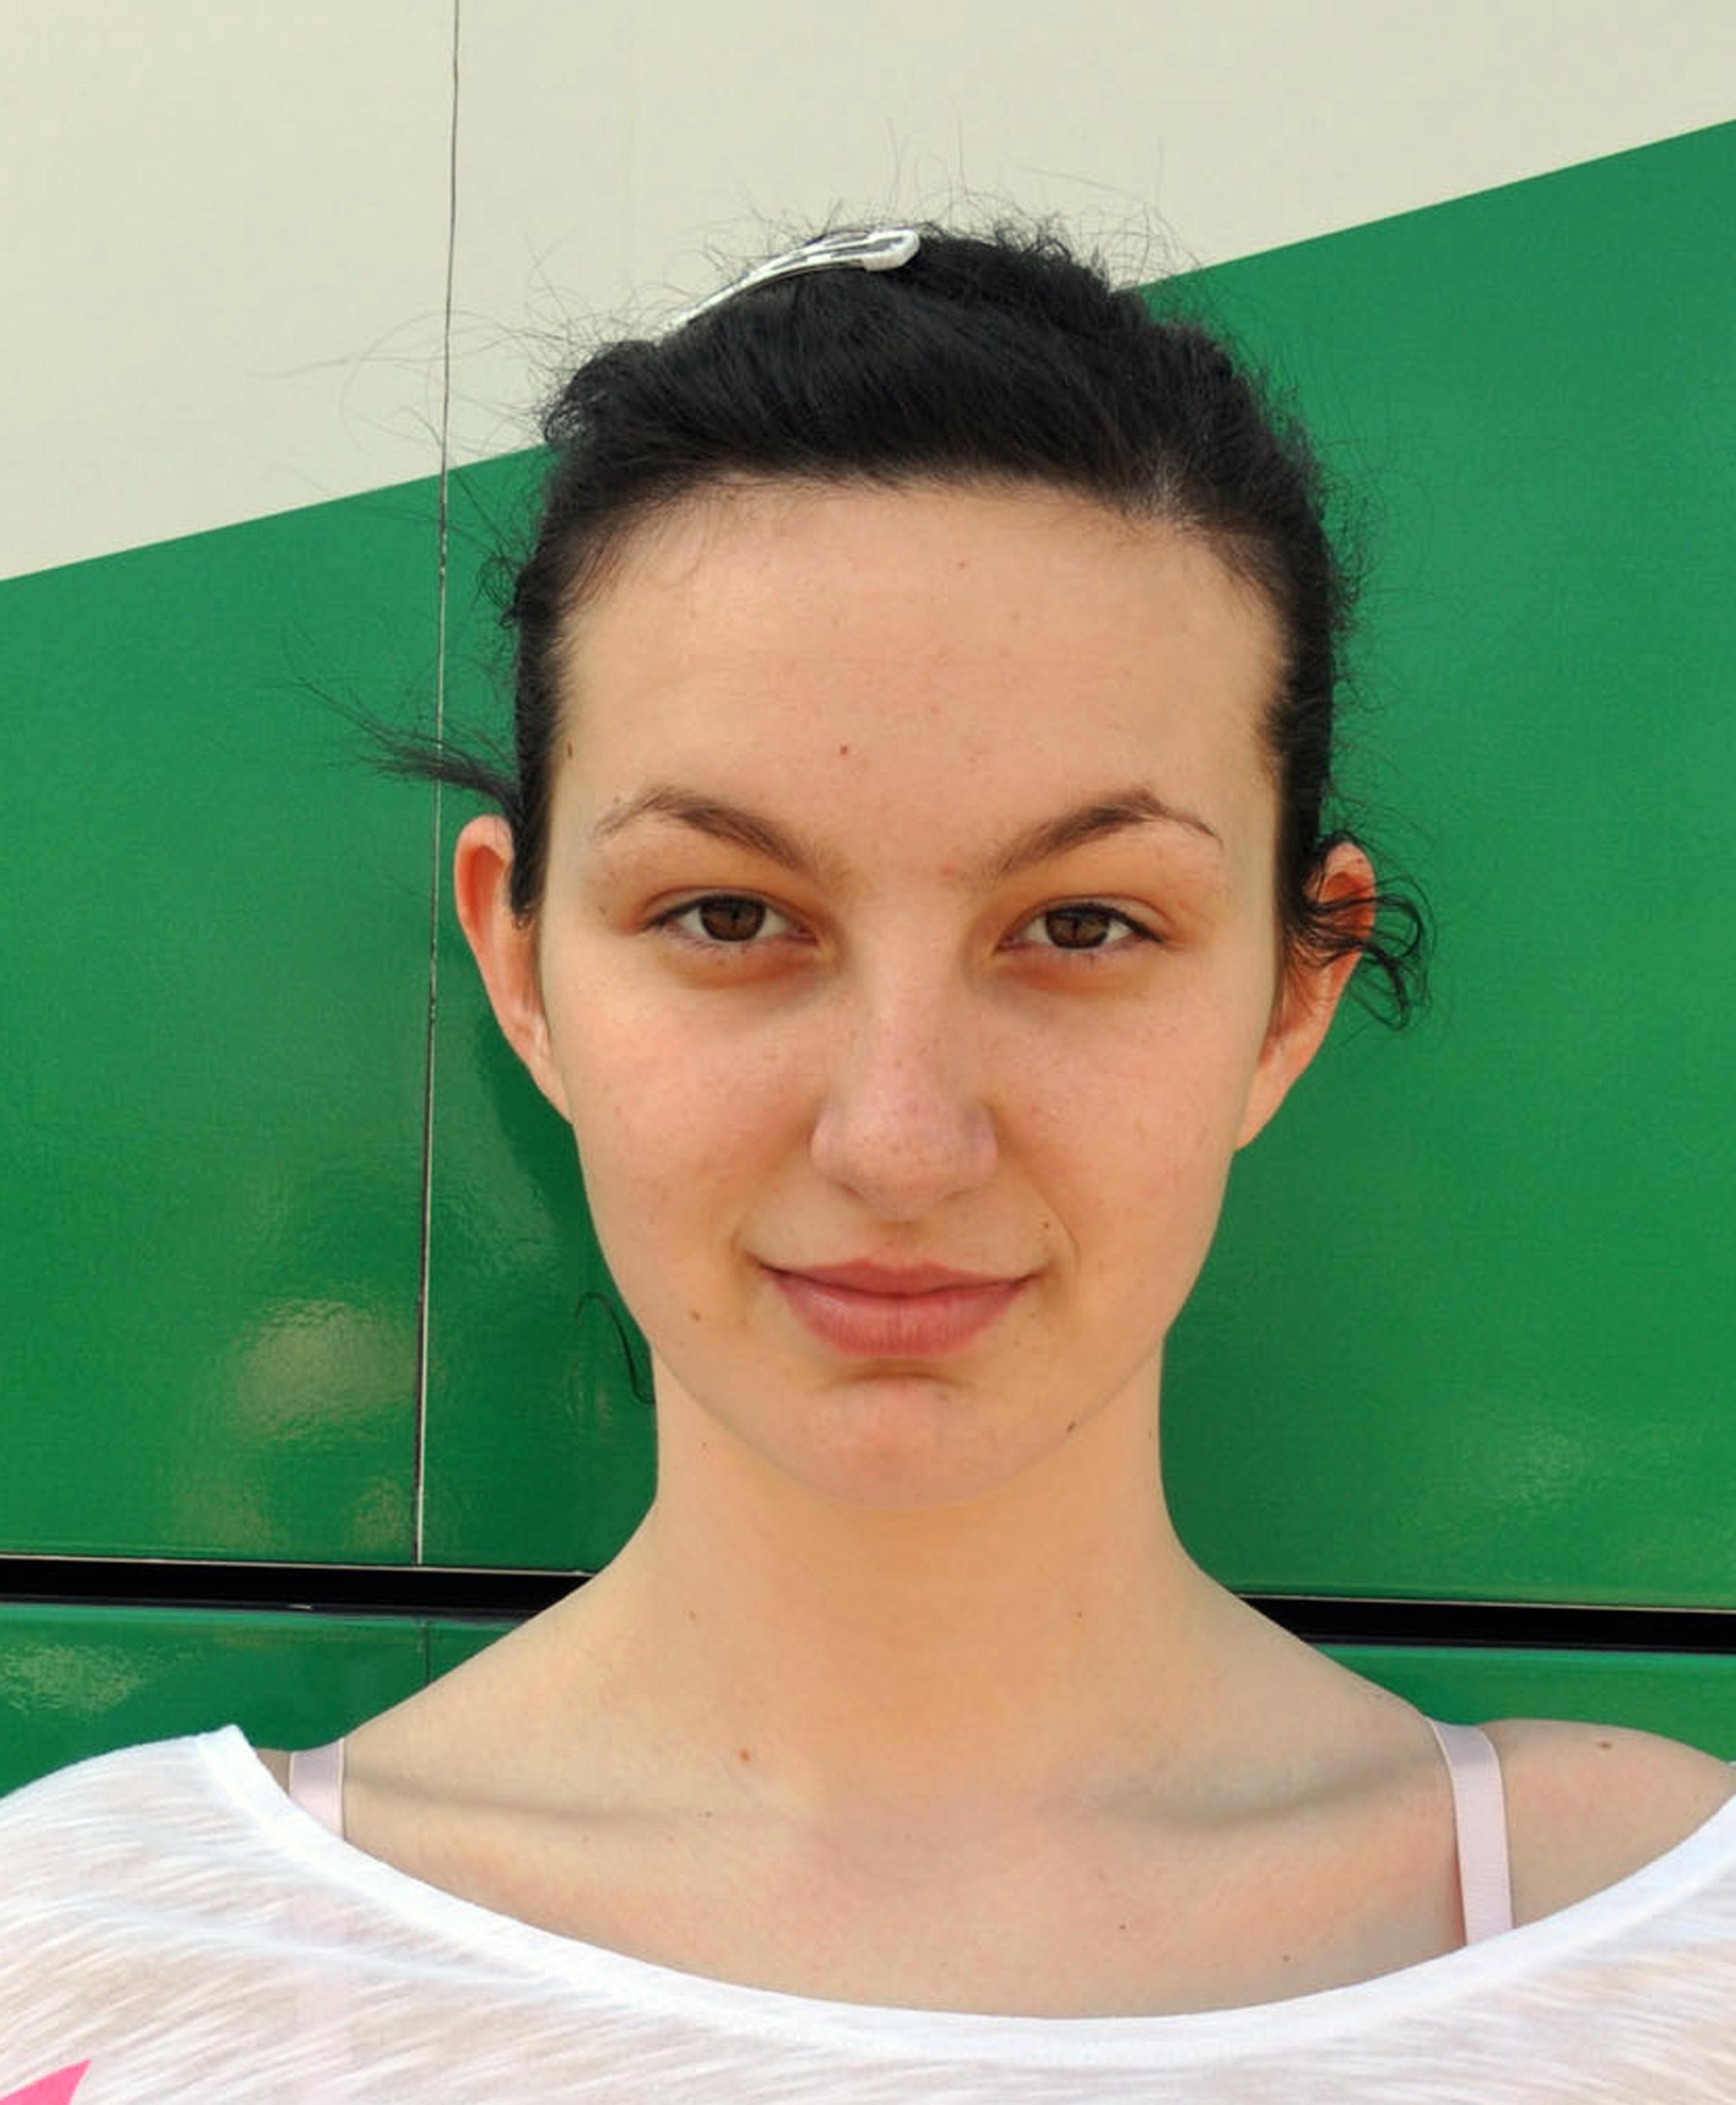 Veselina Grigorova